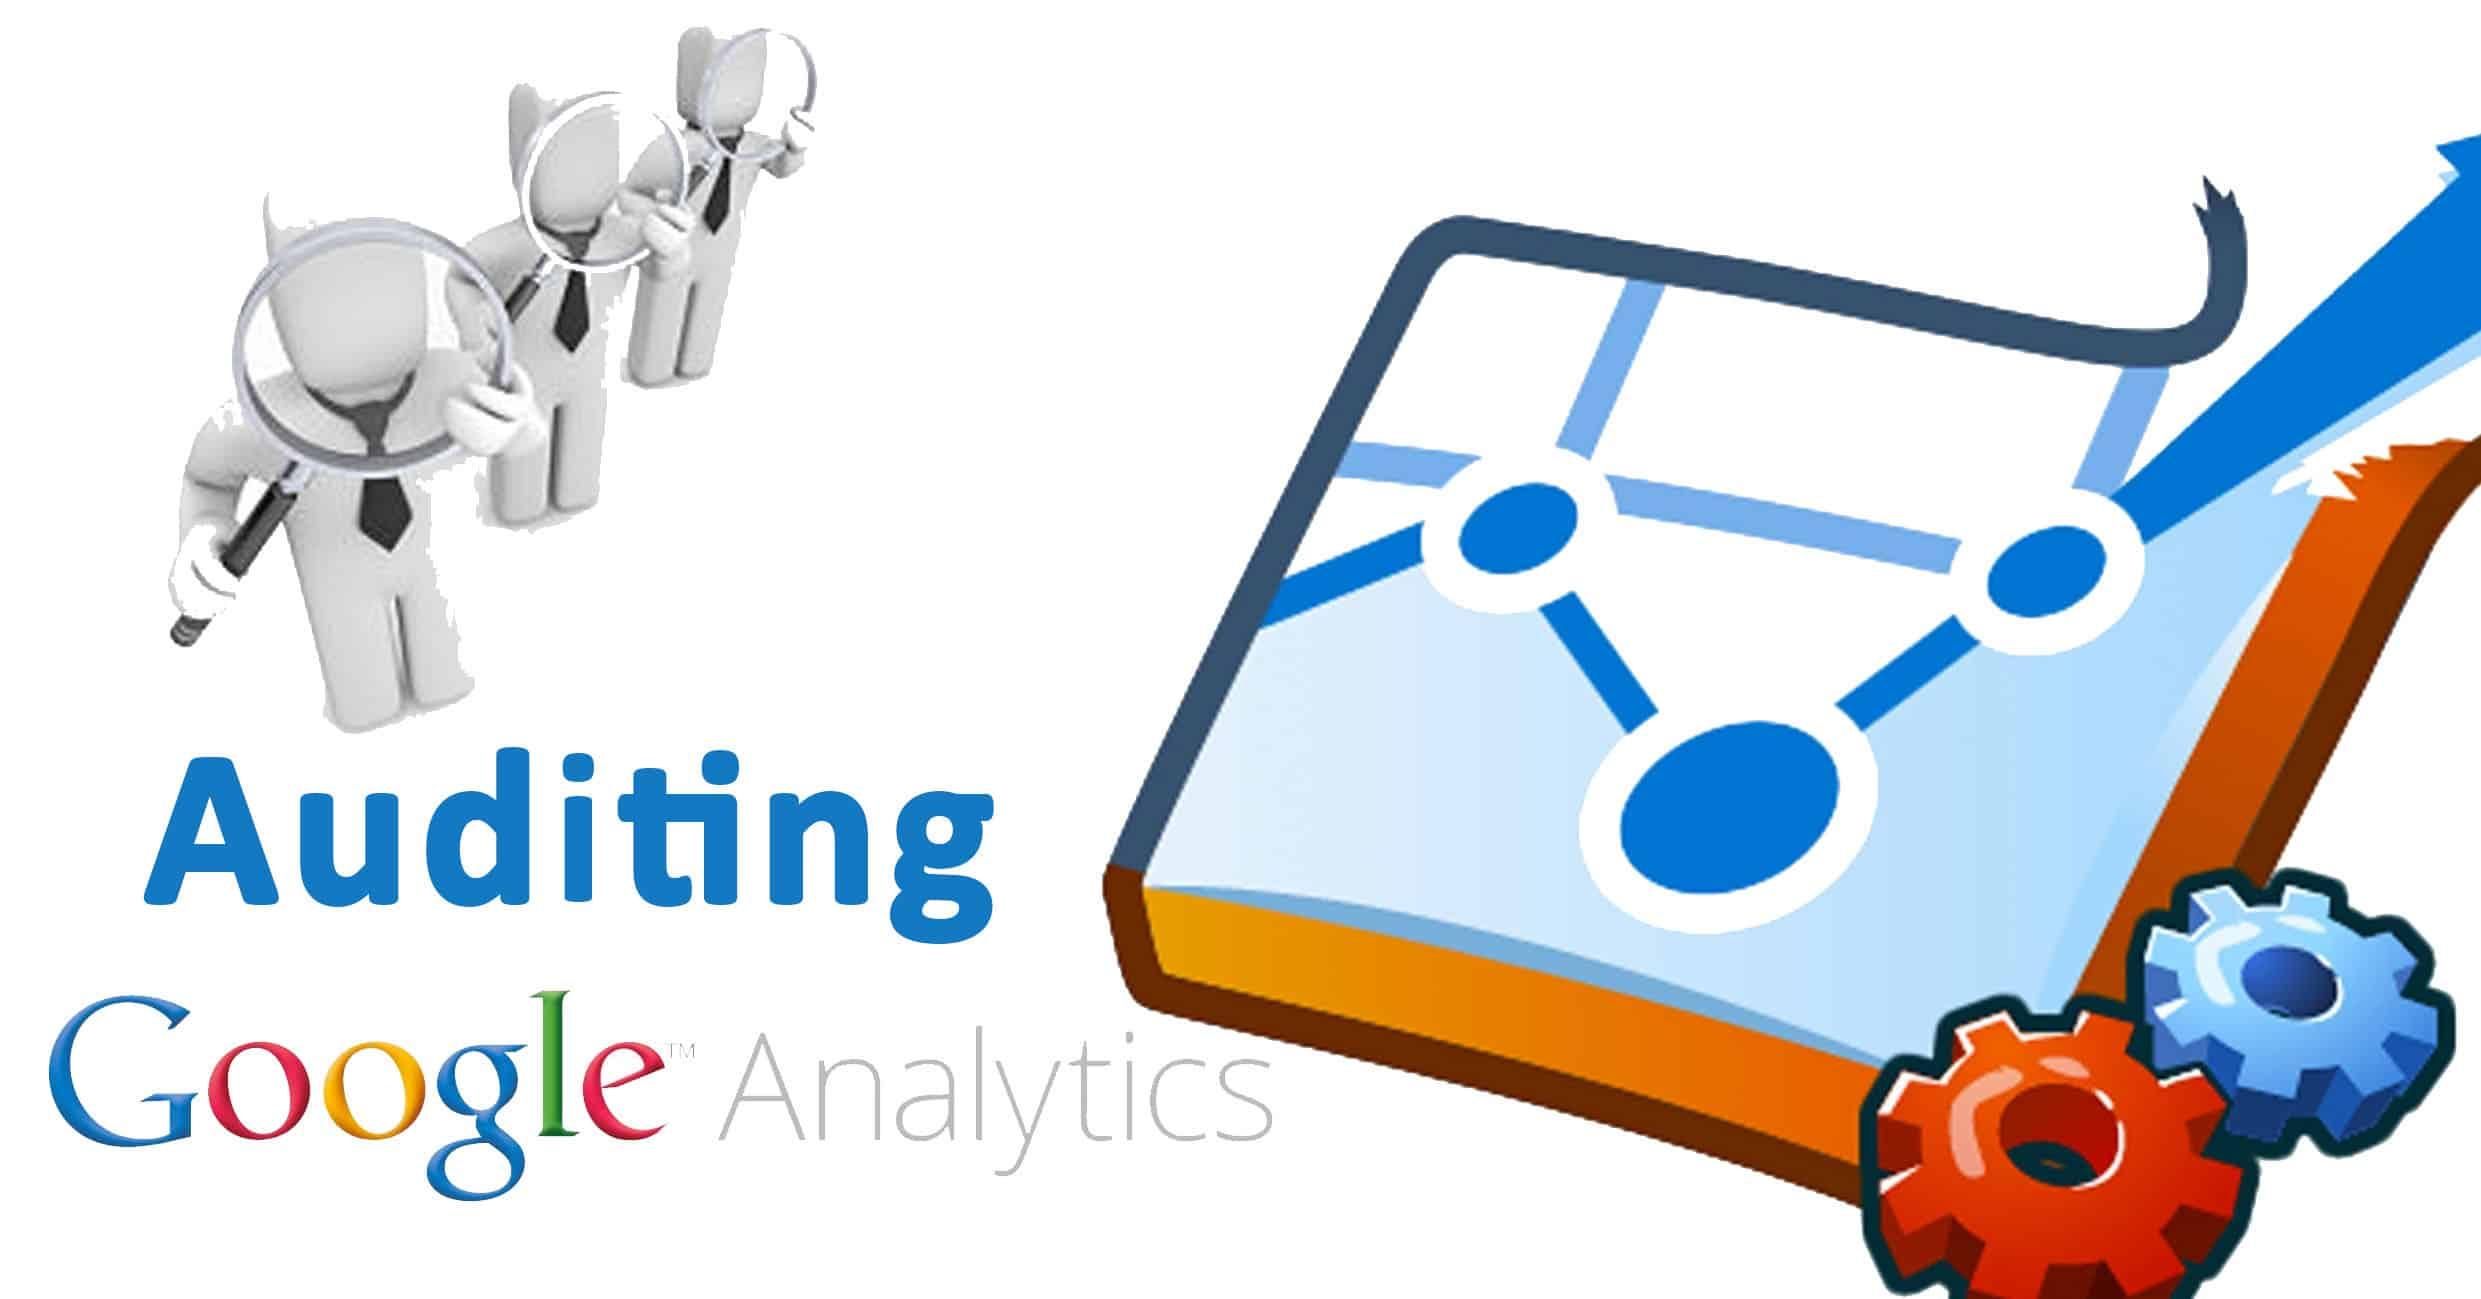 Auditing Google Analytics